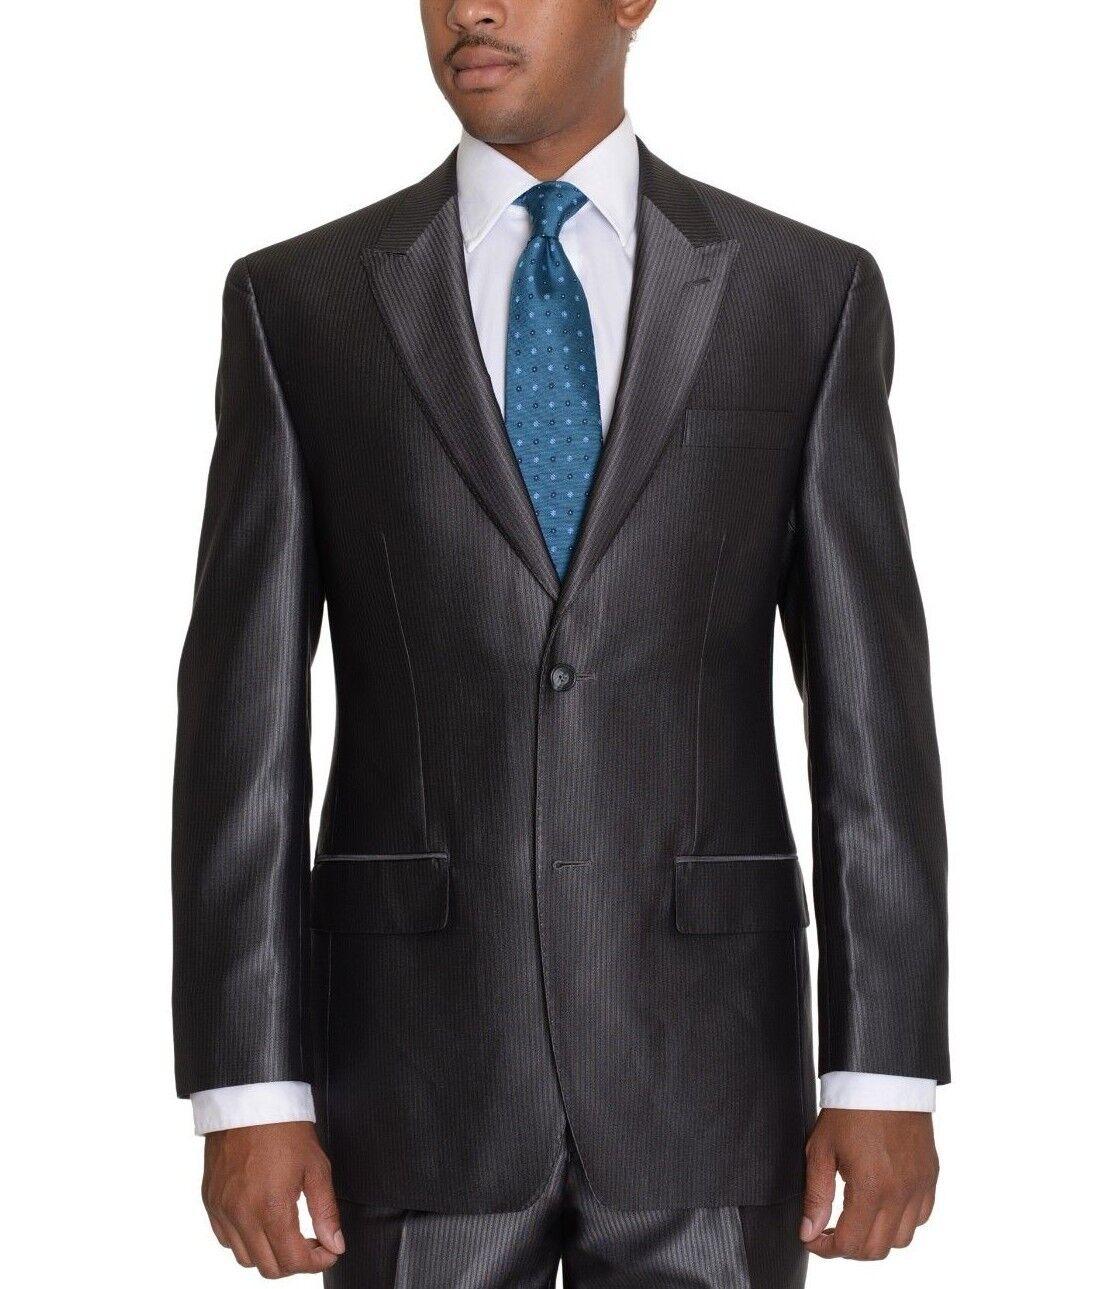 Sean John Classic Fit grau Striped Blazer With peak Lapels